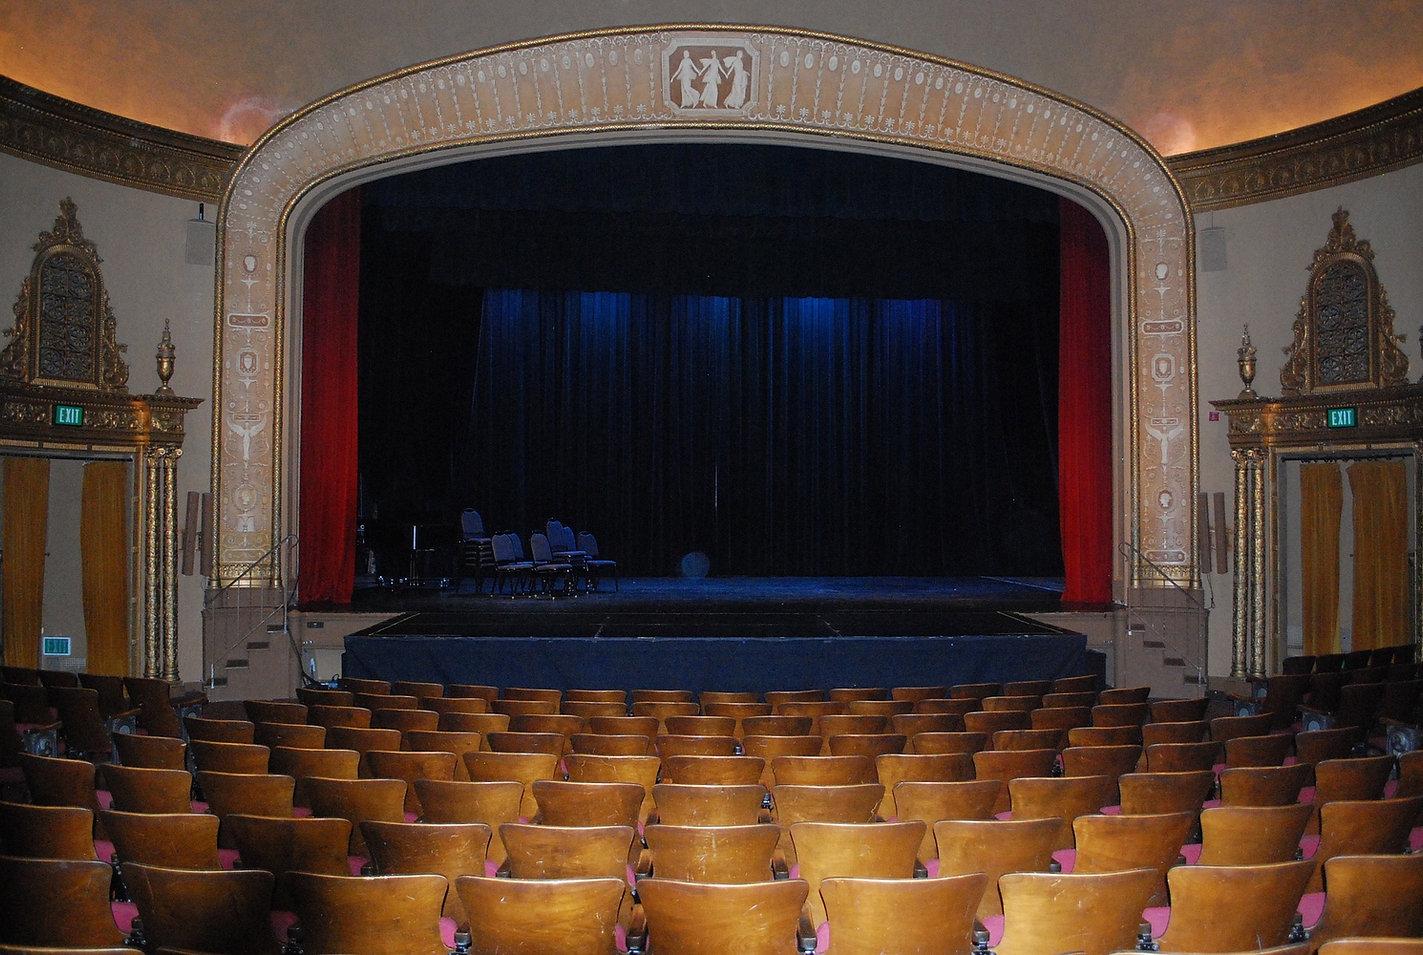 theatre-813305_1920.jpg